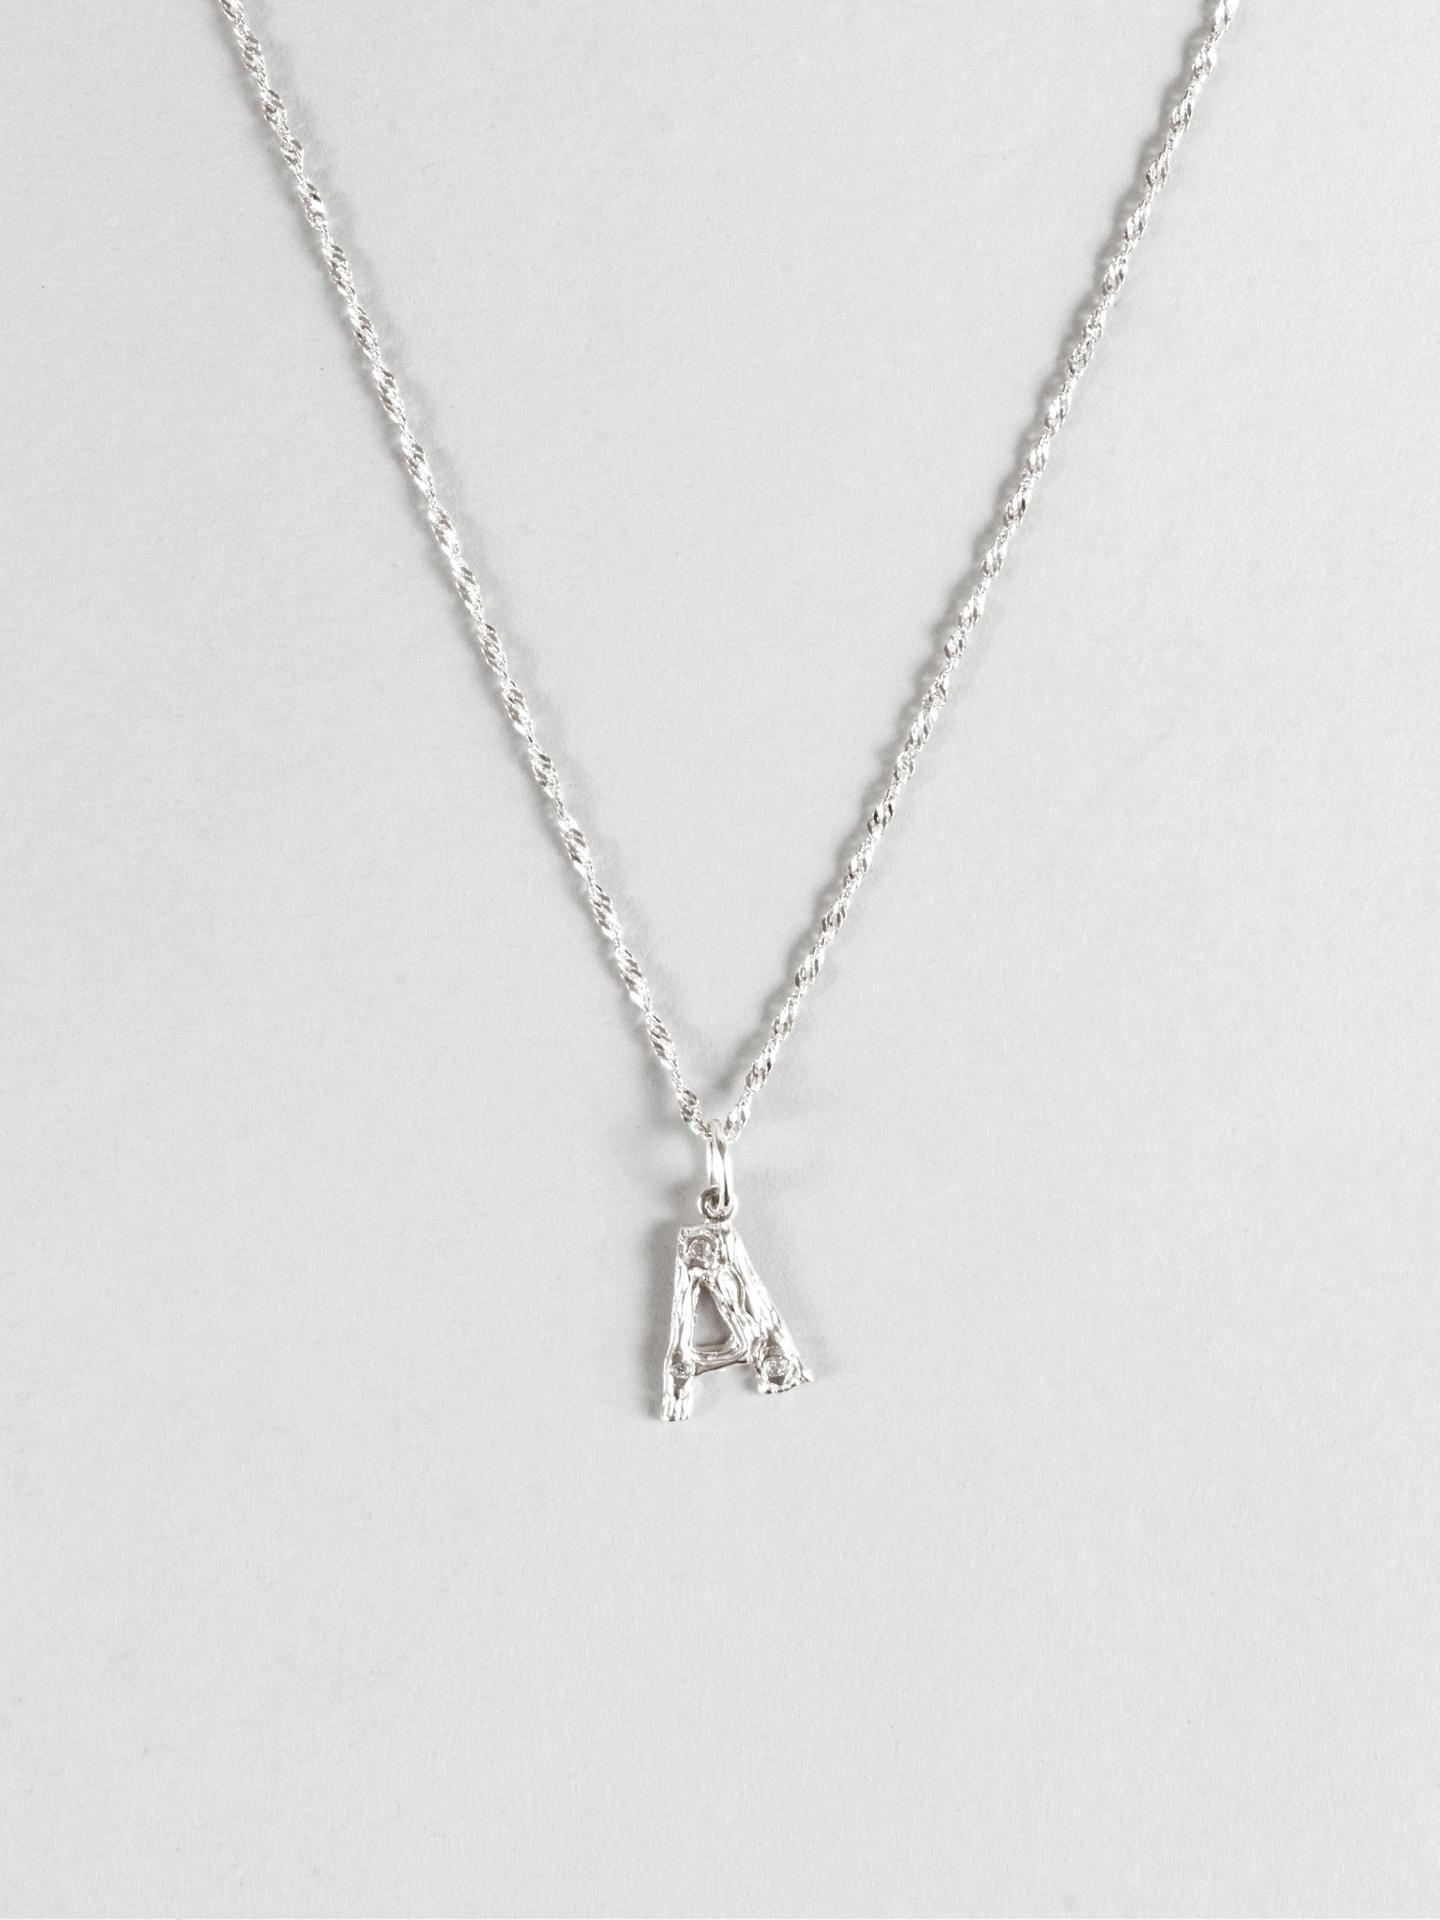 Penelope A Necklace